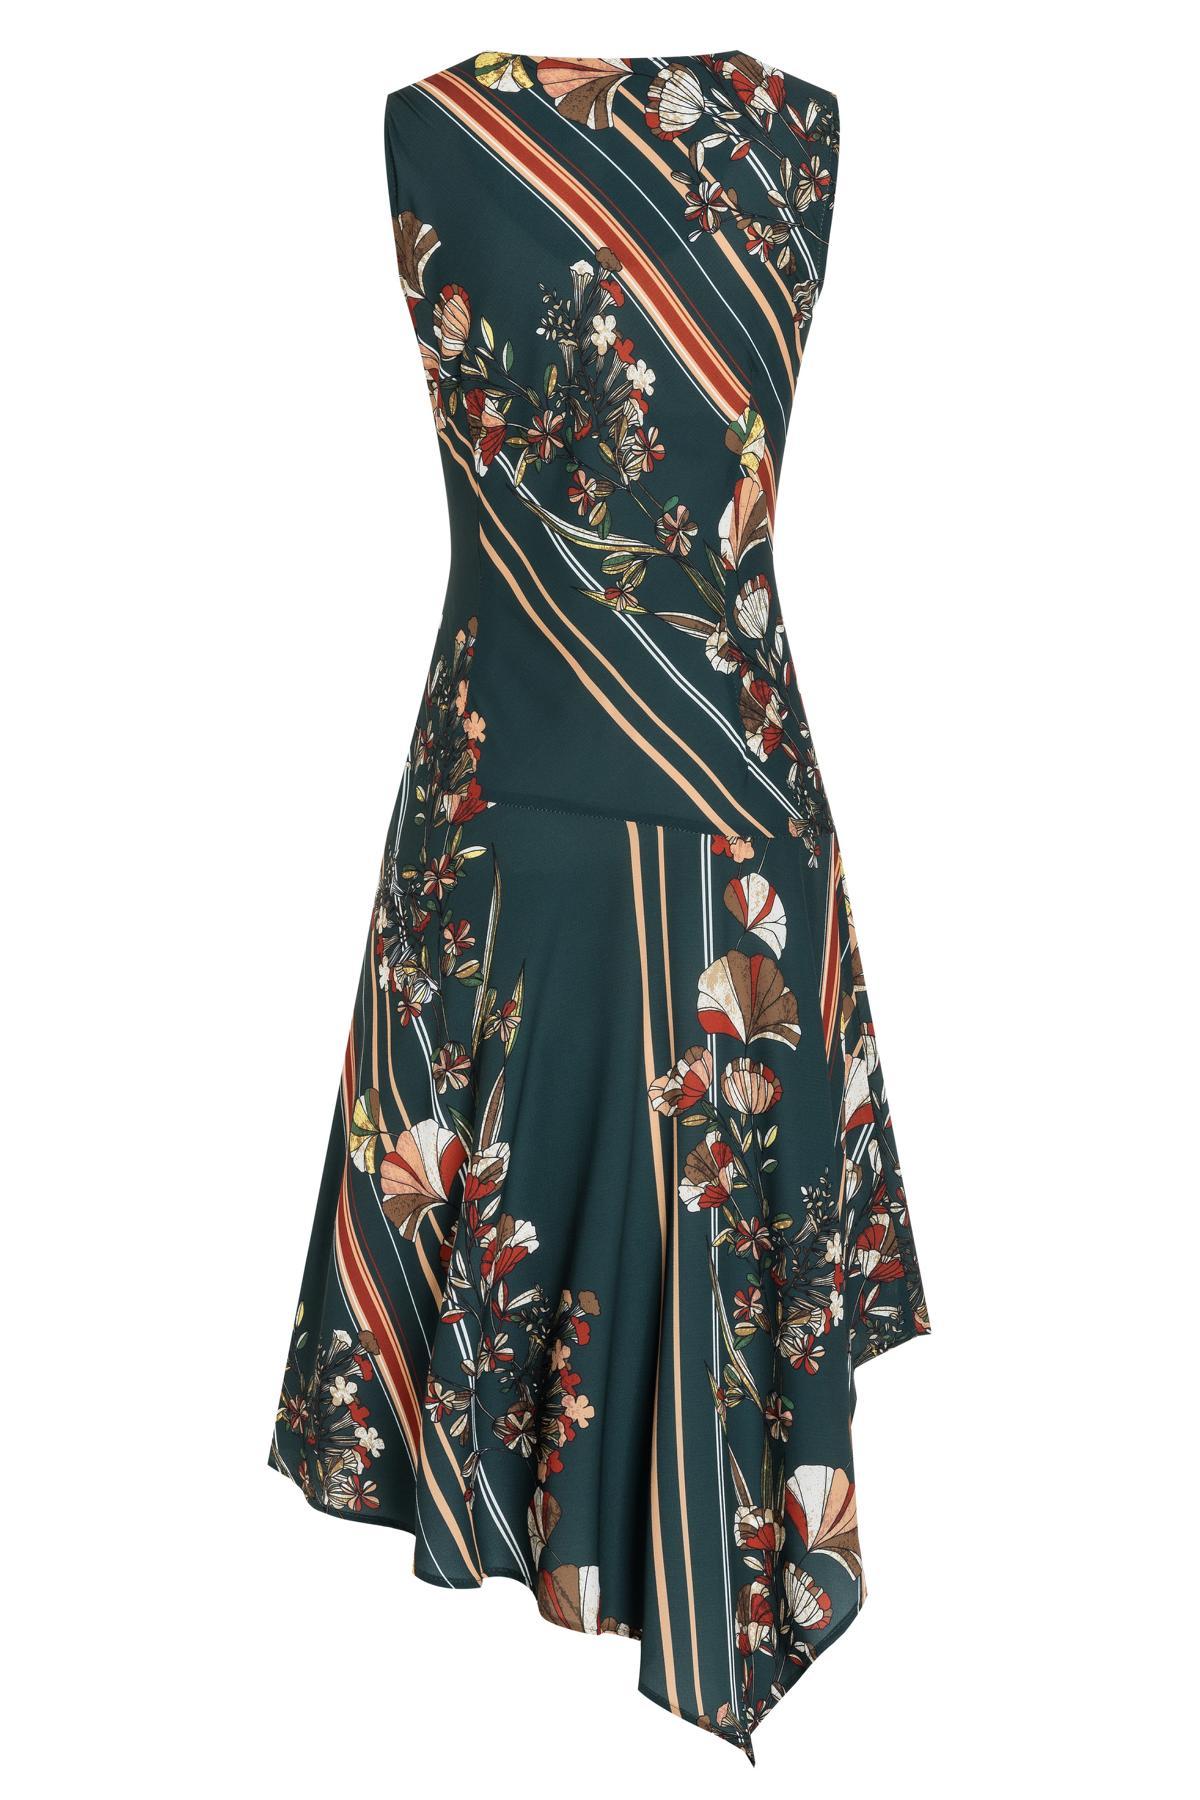 Detailed view 2 of Ana Alcazar Midi Dress Talusa